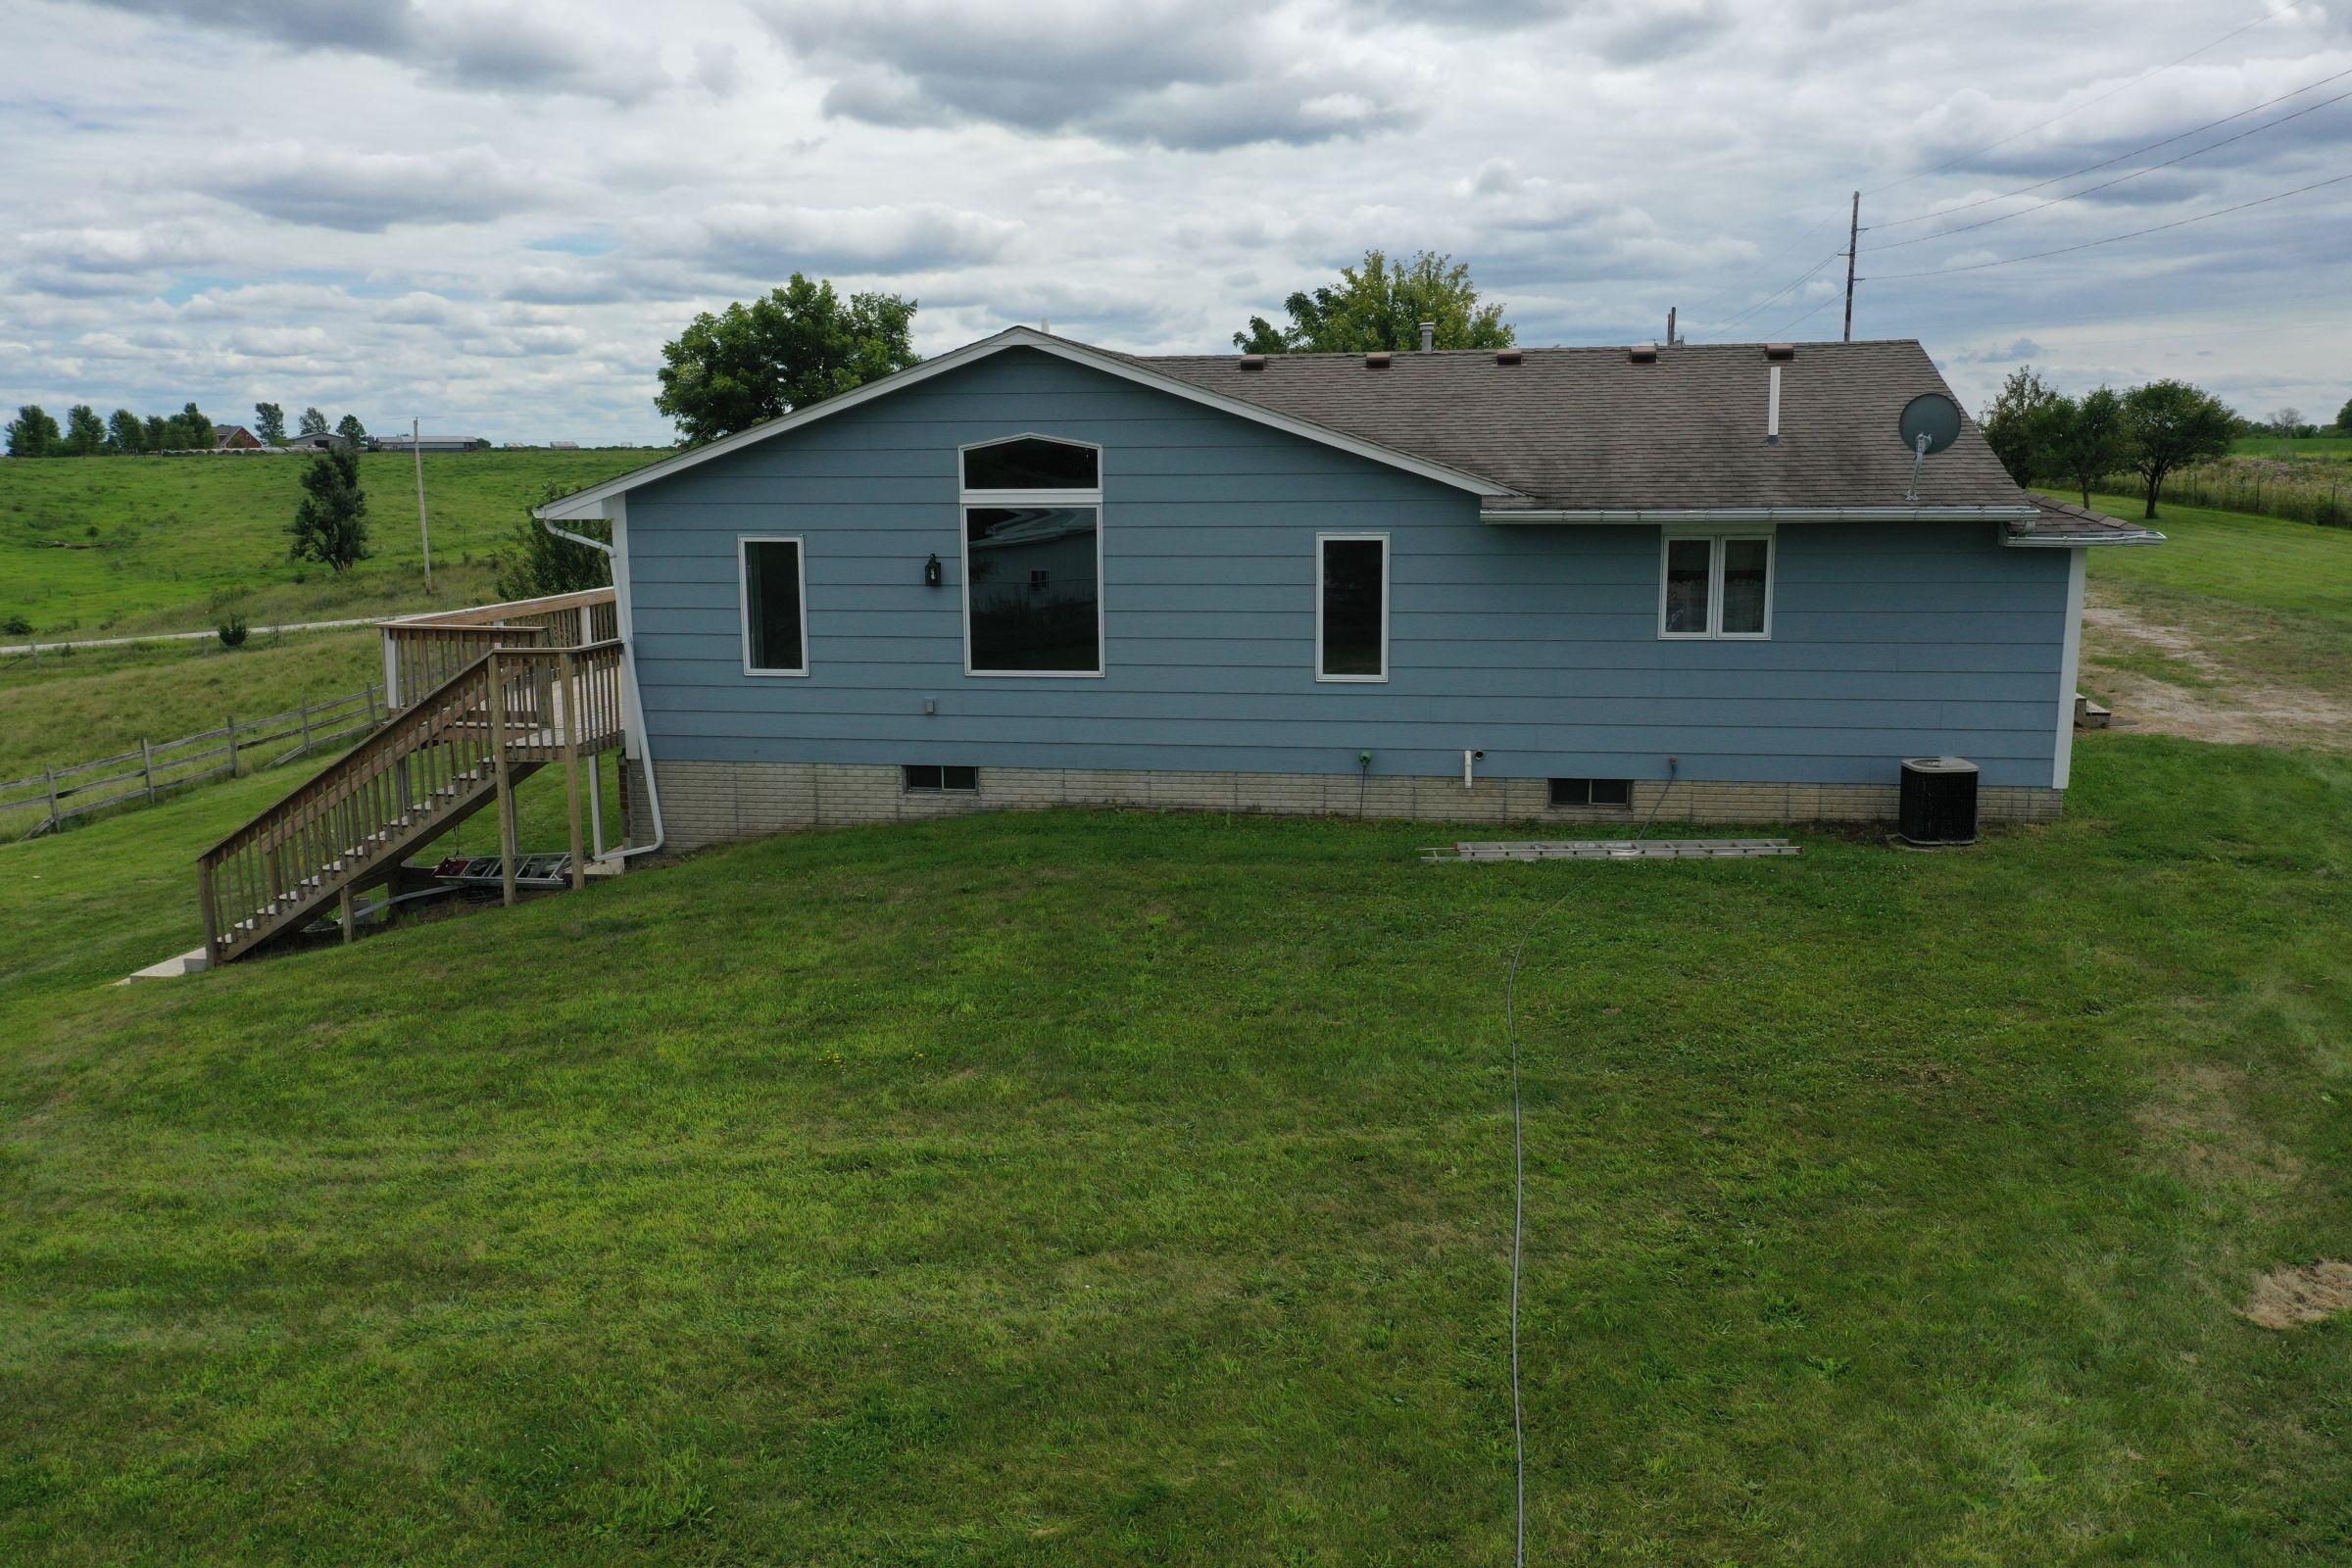 residential-warren-county-iowa-12-acres-listing-number-15104-2-2020-08-08-185050.jpg